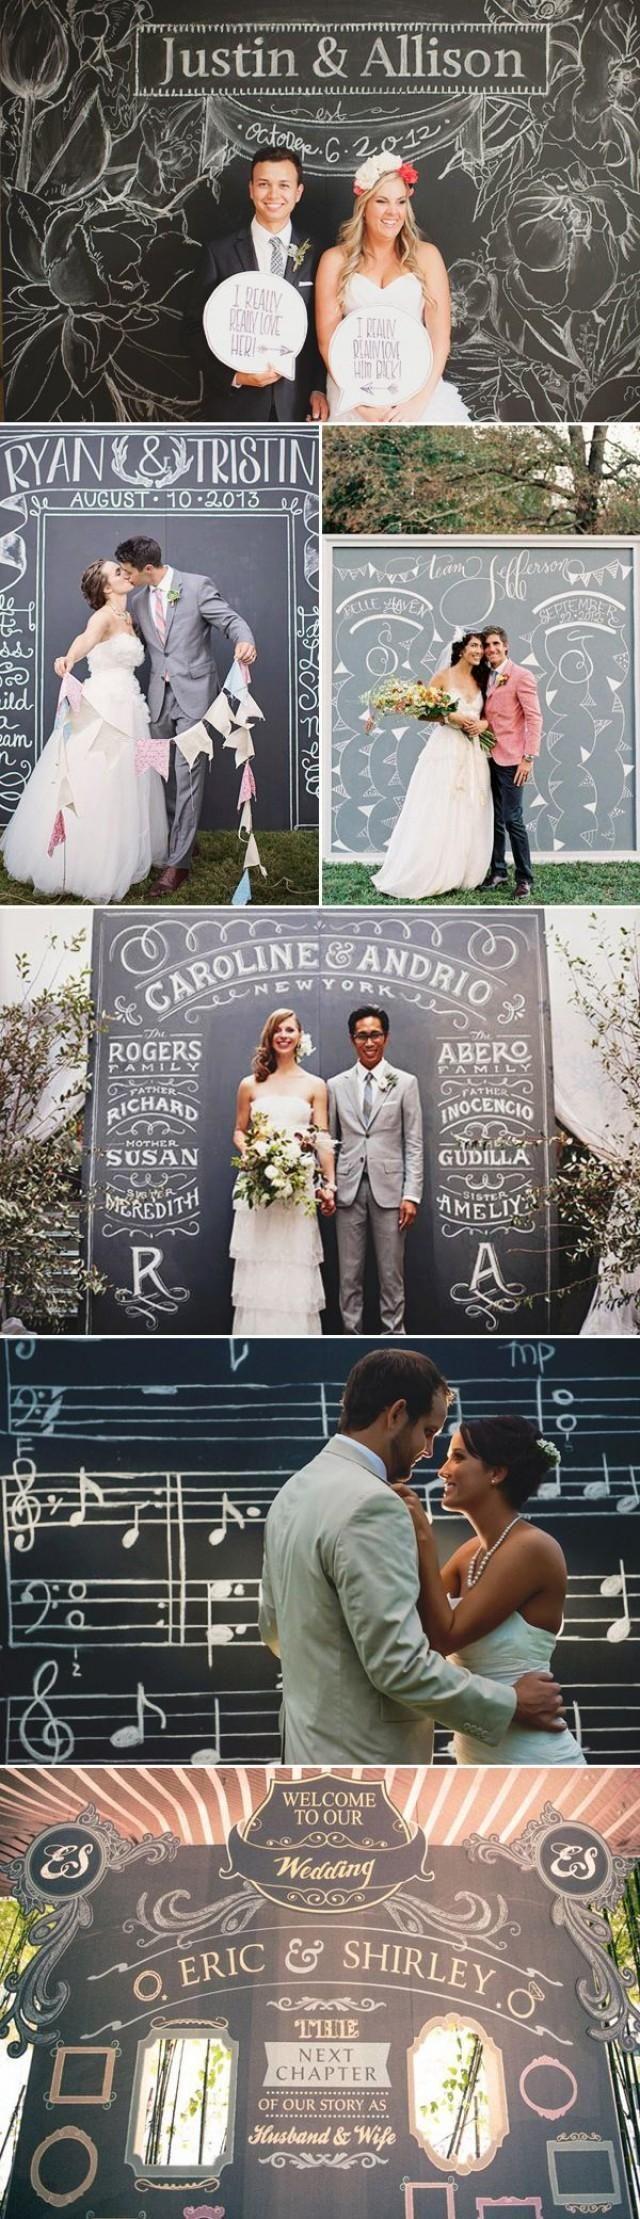 45 Creative Wedding Photo Backdrops Guest